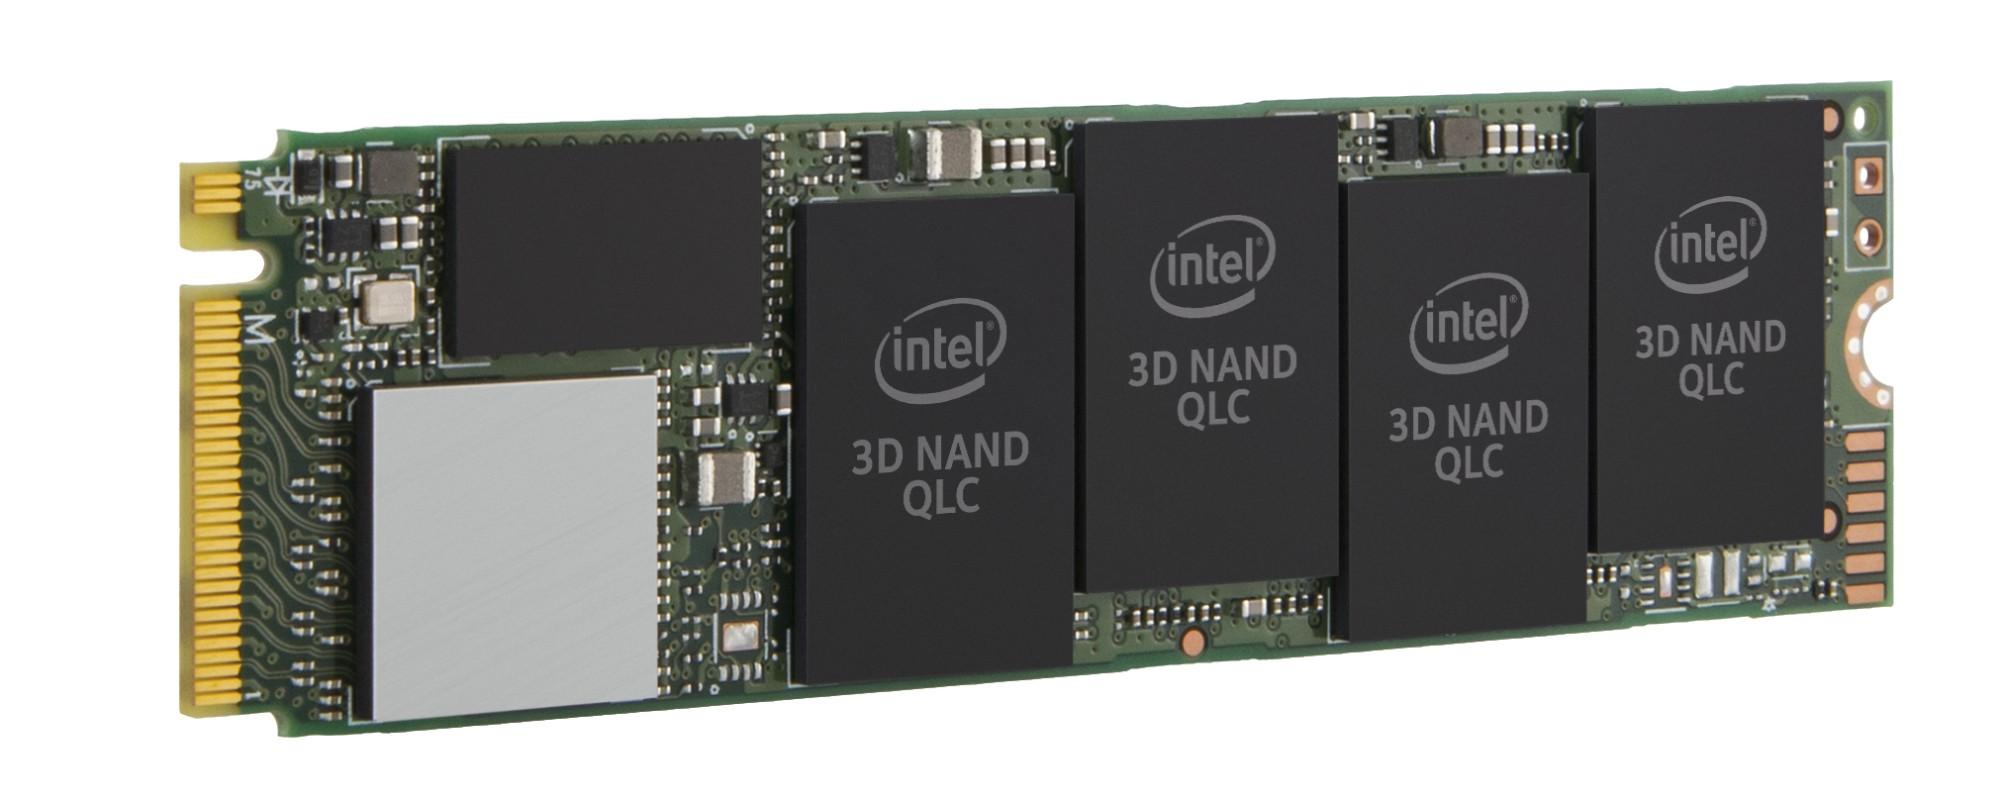 Intel Consumer 660p M.2 2048 GB PCI Express 3.0 3D2 QLC NVMe